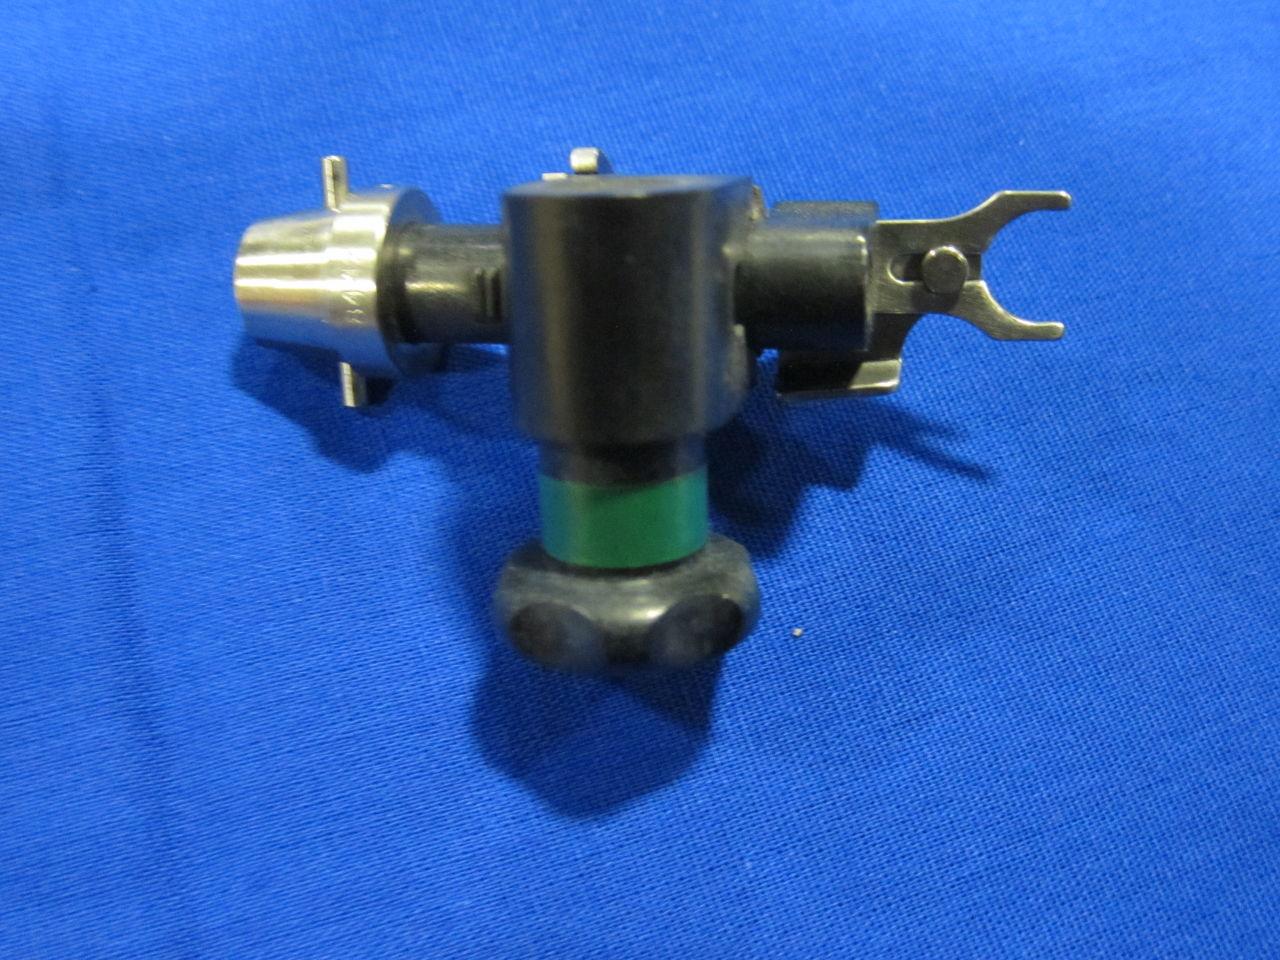 WAPPLER 11F, 1-3F 8432 Cystoscope